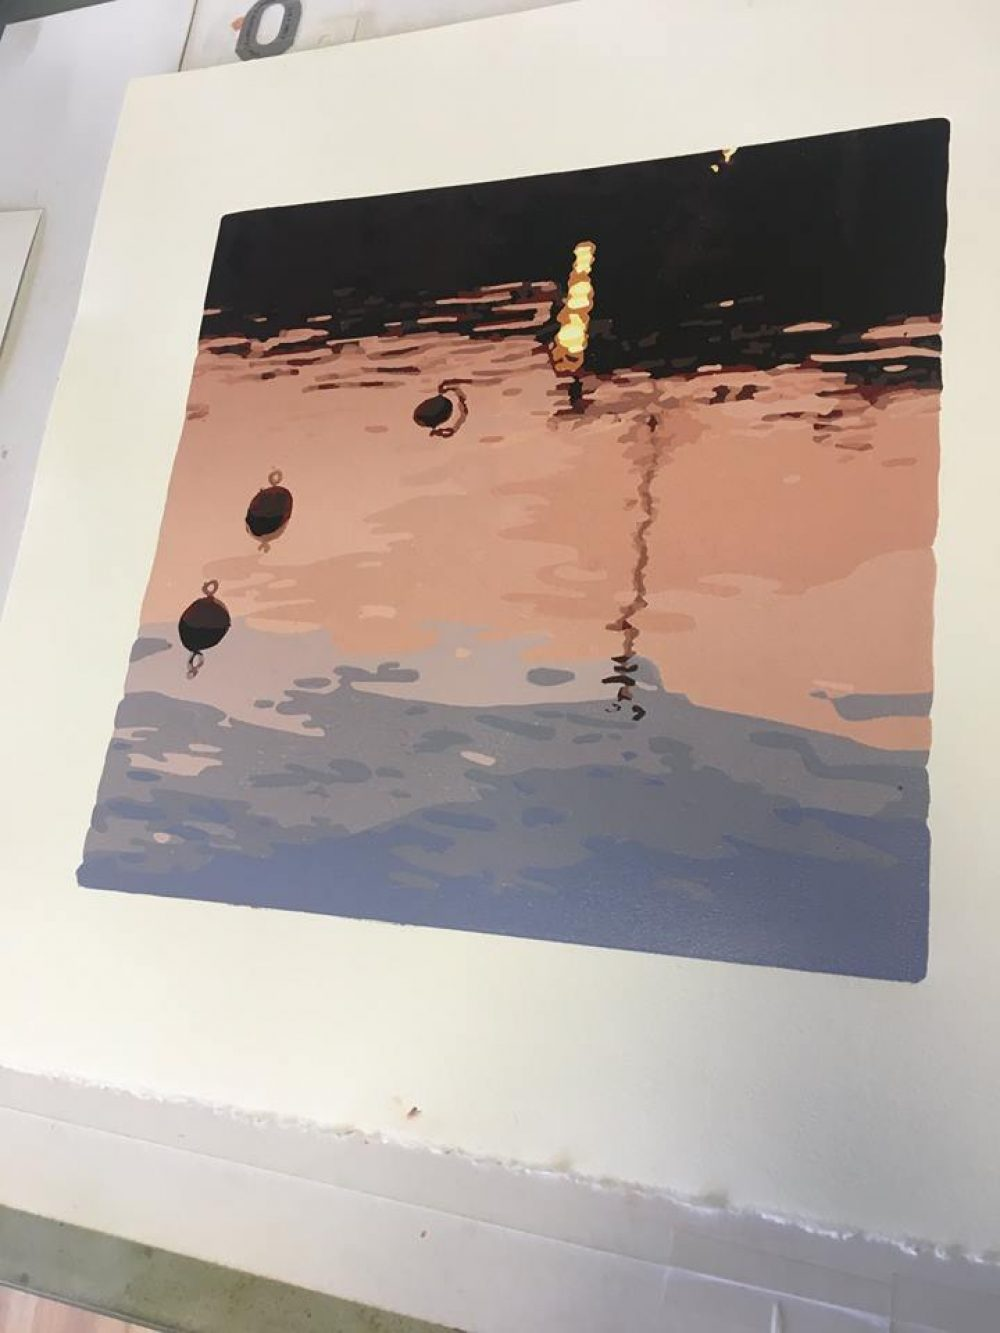 Reduction linoprint - Safe Haven, handprinted by Kim Herringe